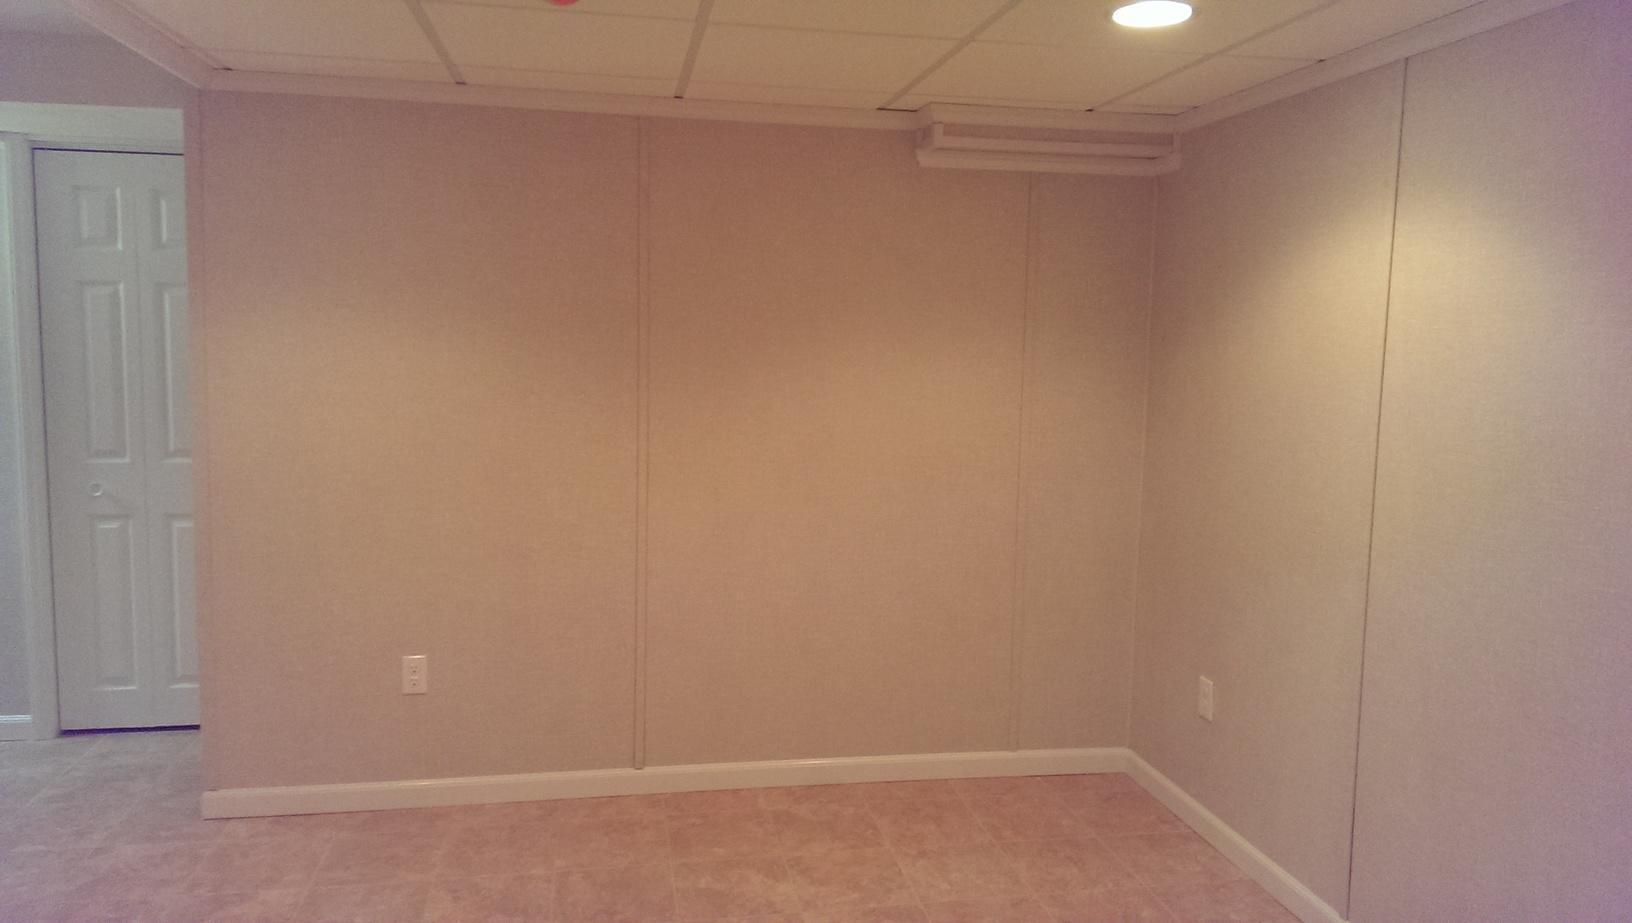 Basement Flooring and Walls